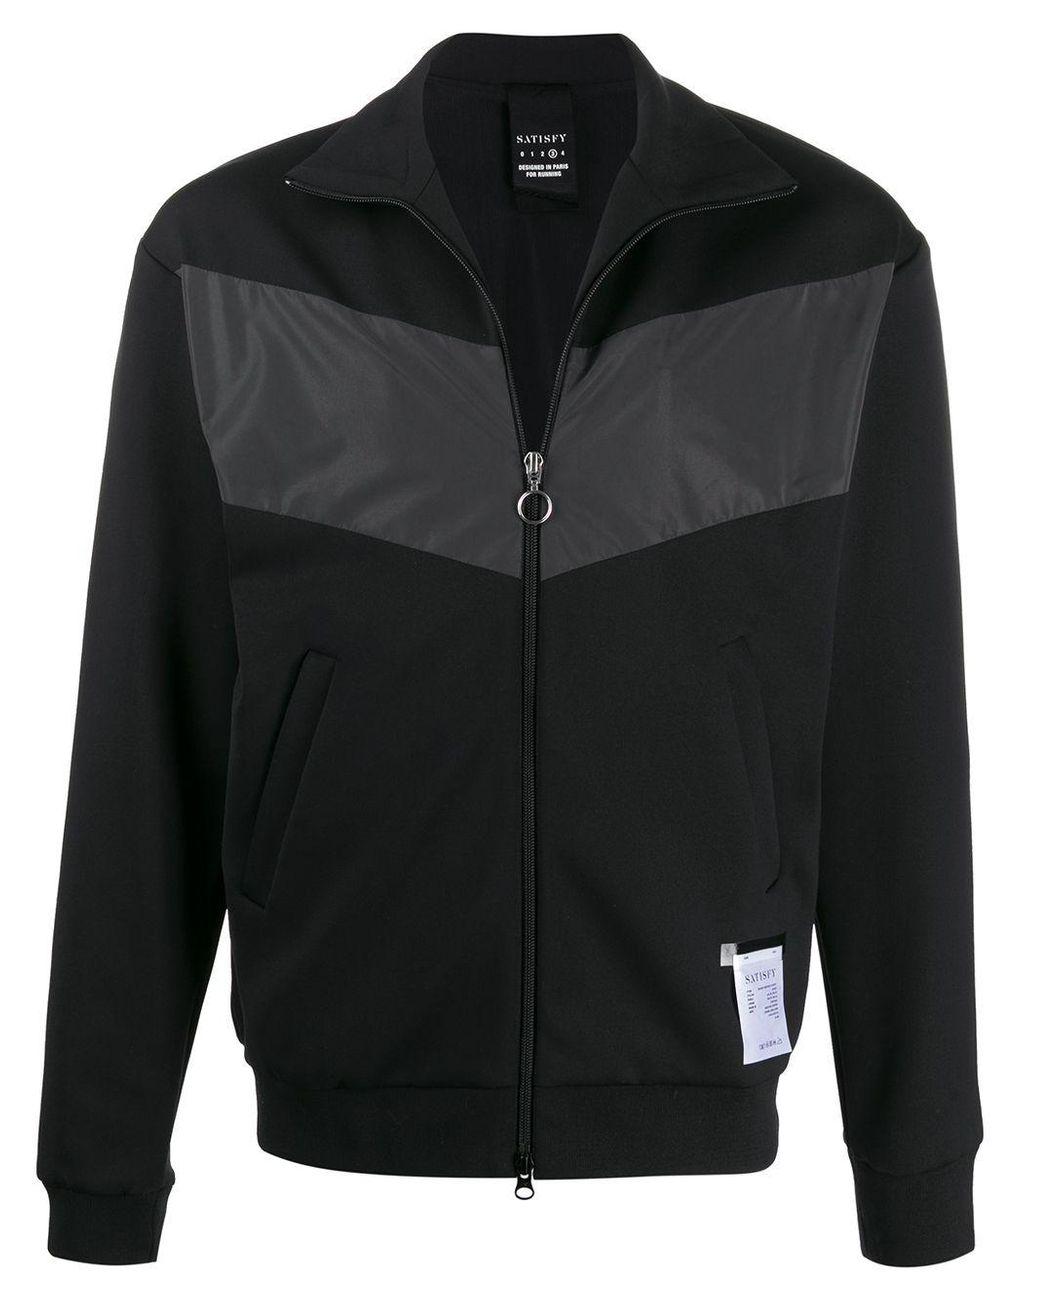 Encogimiento Asimilación Turismo  Satisfy Synthetic Shell-trimmed Tecnospacer Zip-up Jacket in Black for Men  - Save 54% - Lyst